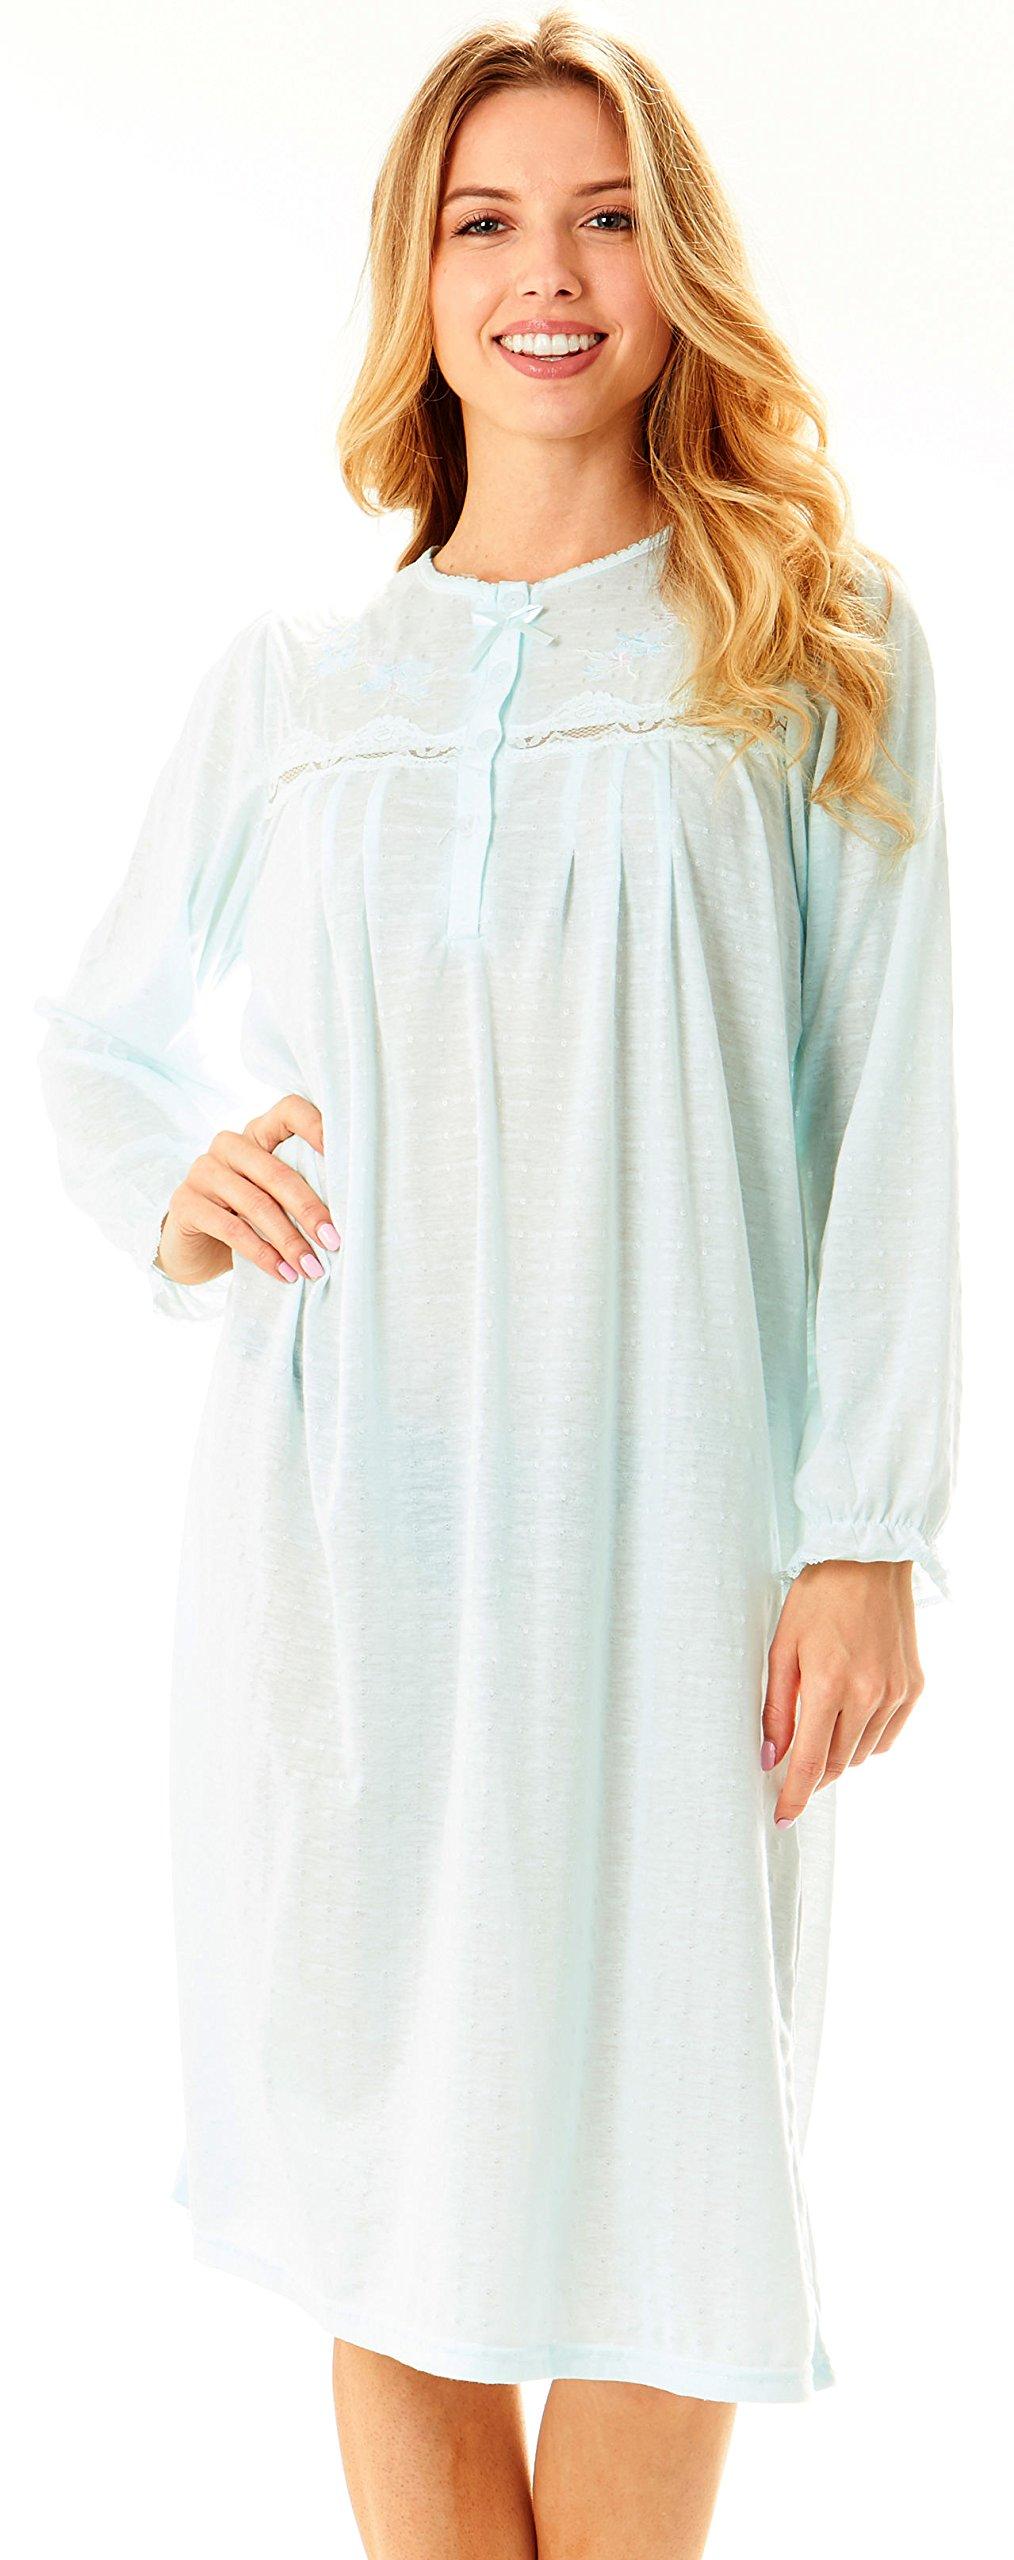 Women Long Sleeve Cotton Night Gown/Sleepwear/Sleep Dress/Nightshirt ...